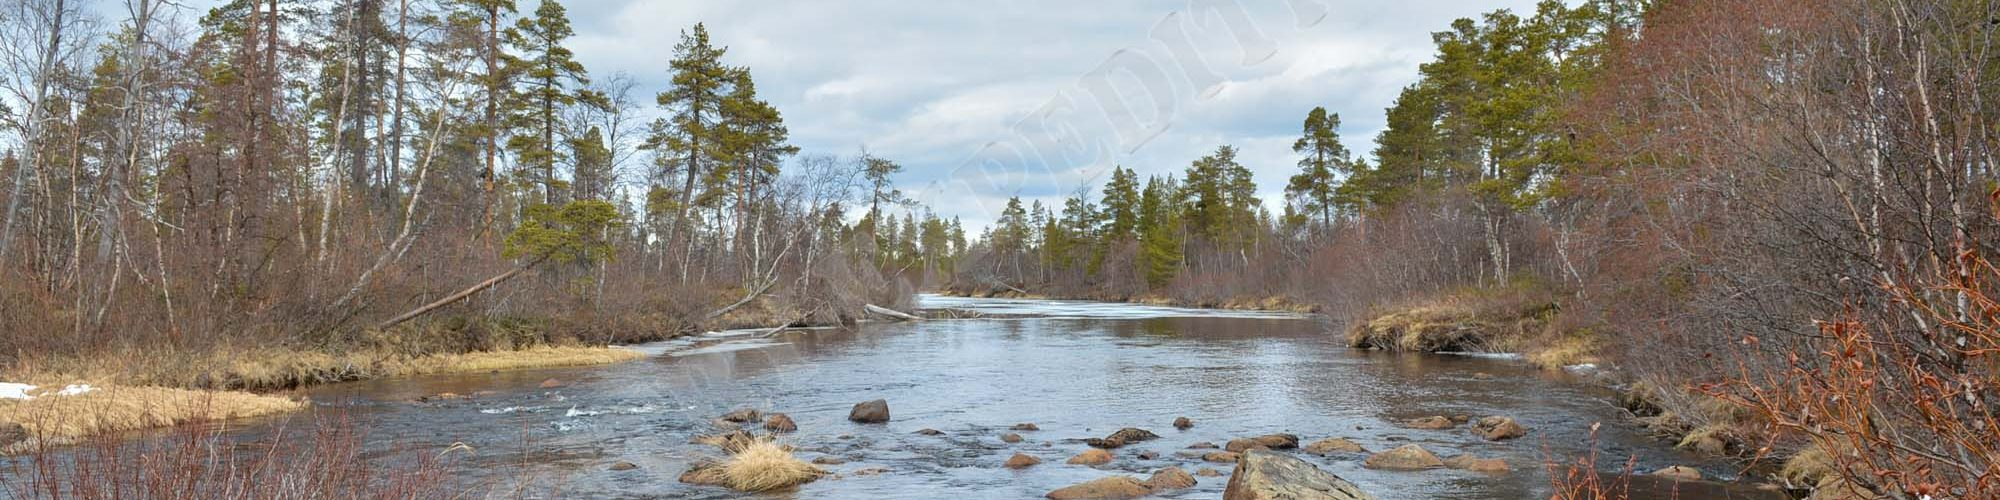 Finnland: Lemmenjoki & Ivalojoki